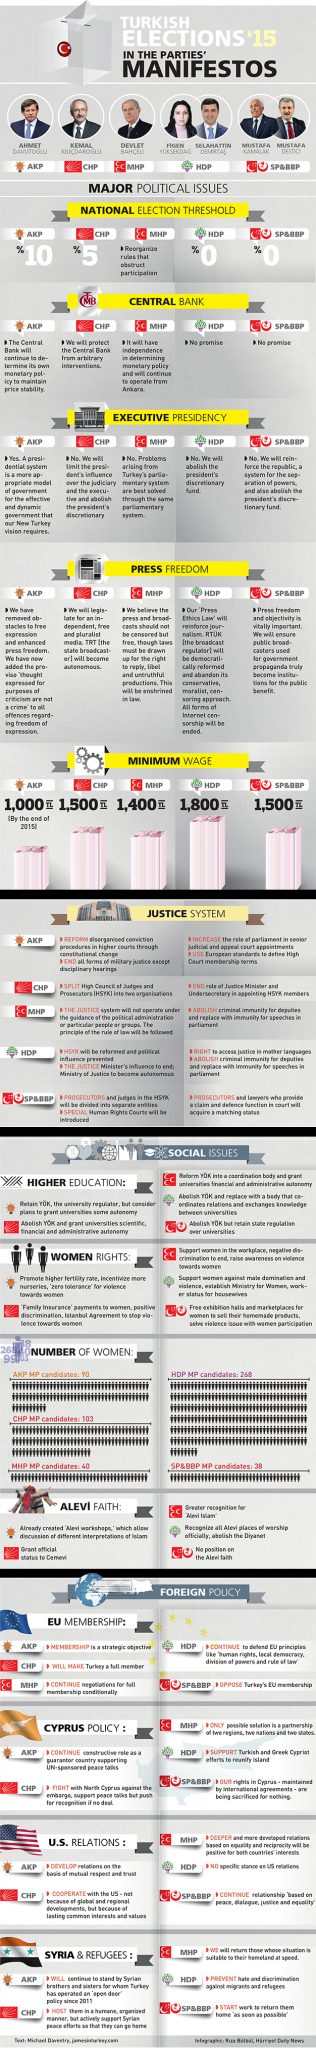 qe23526election